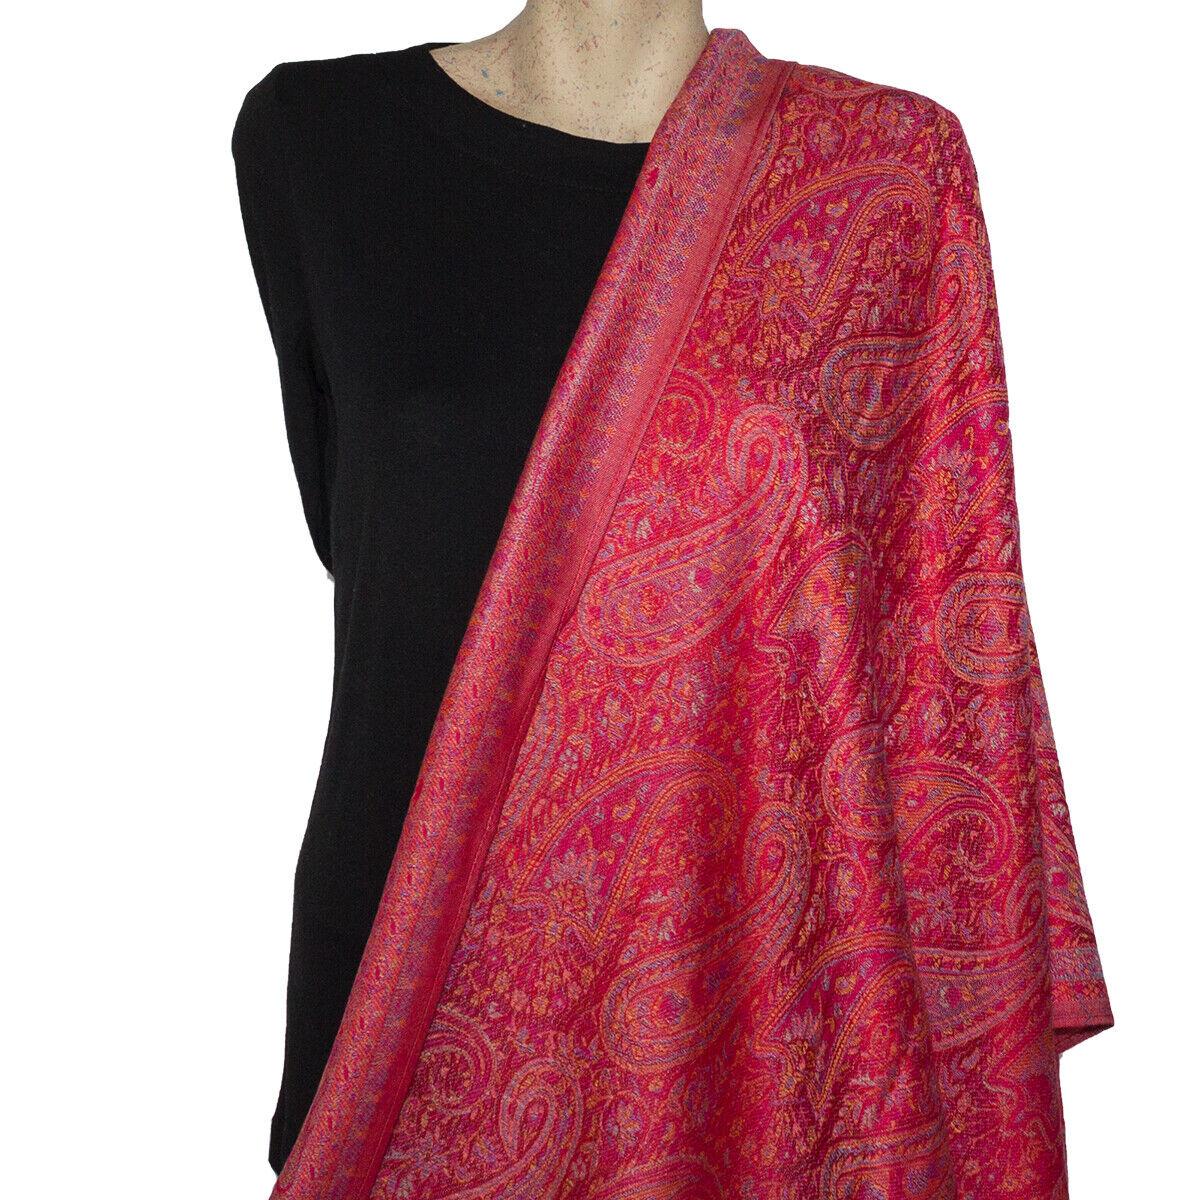 Sparkling  Pashmina  Paisley Shawl//Wrap//Scarf #2